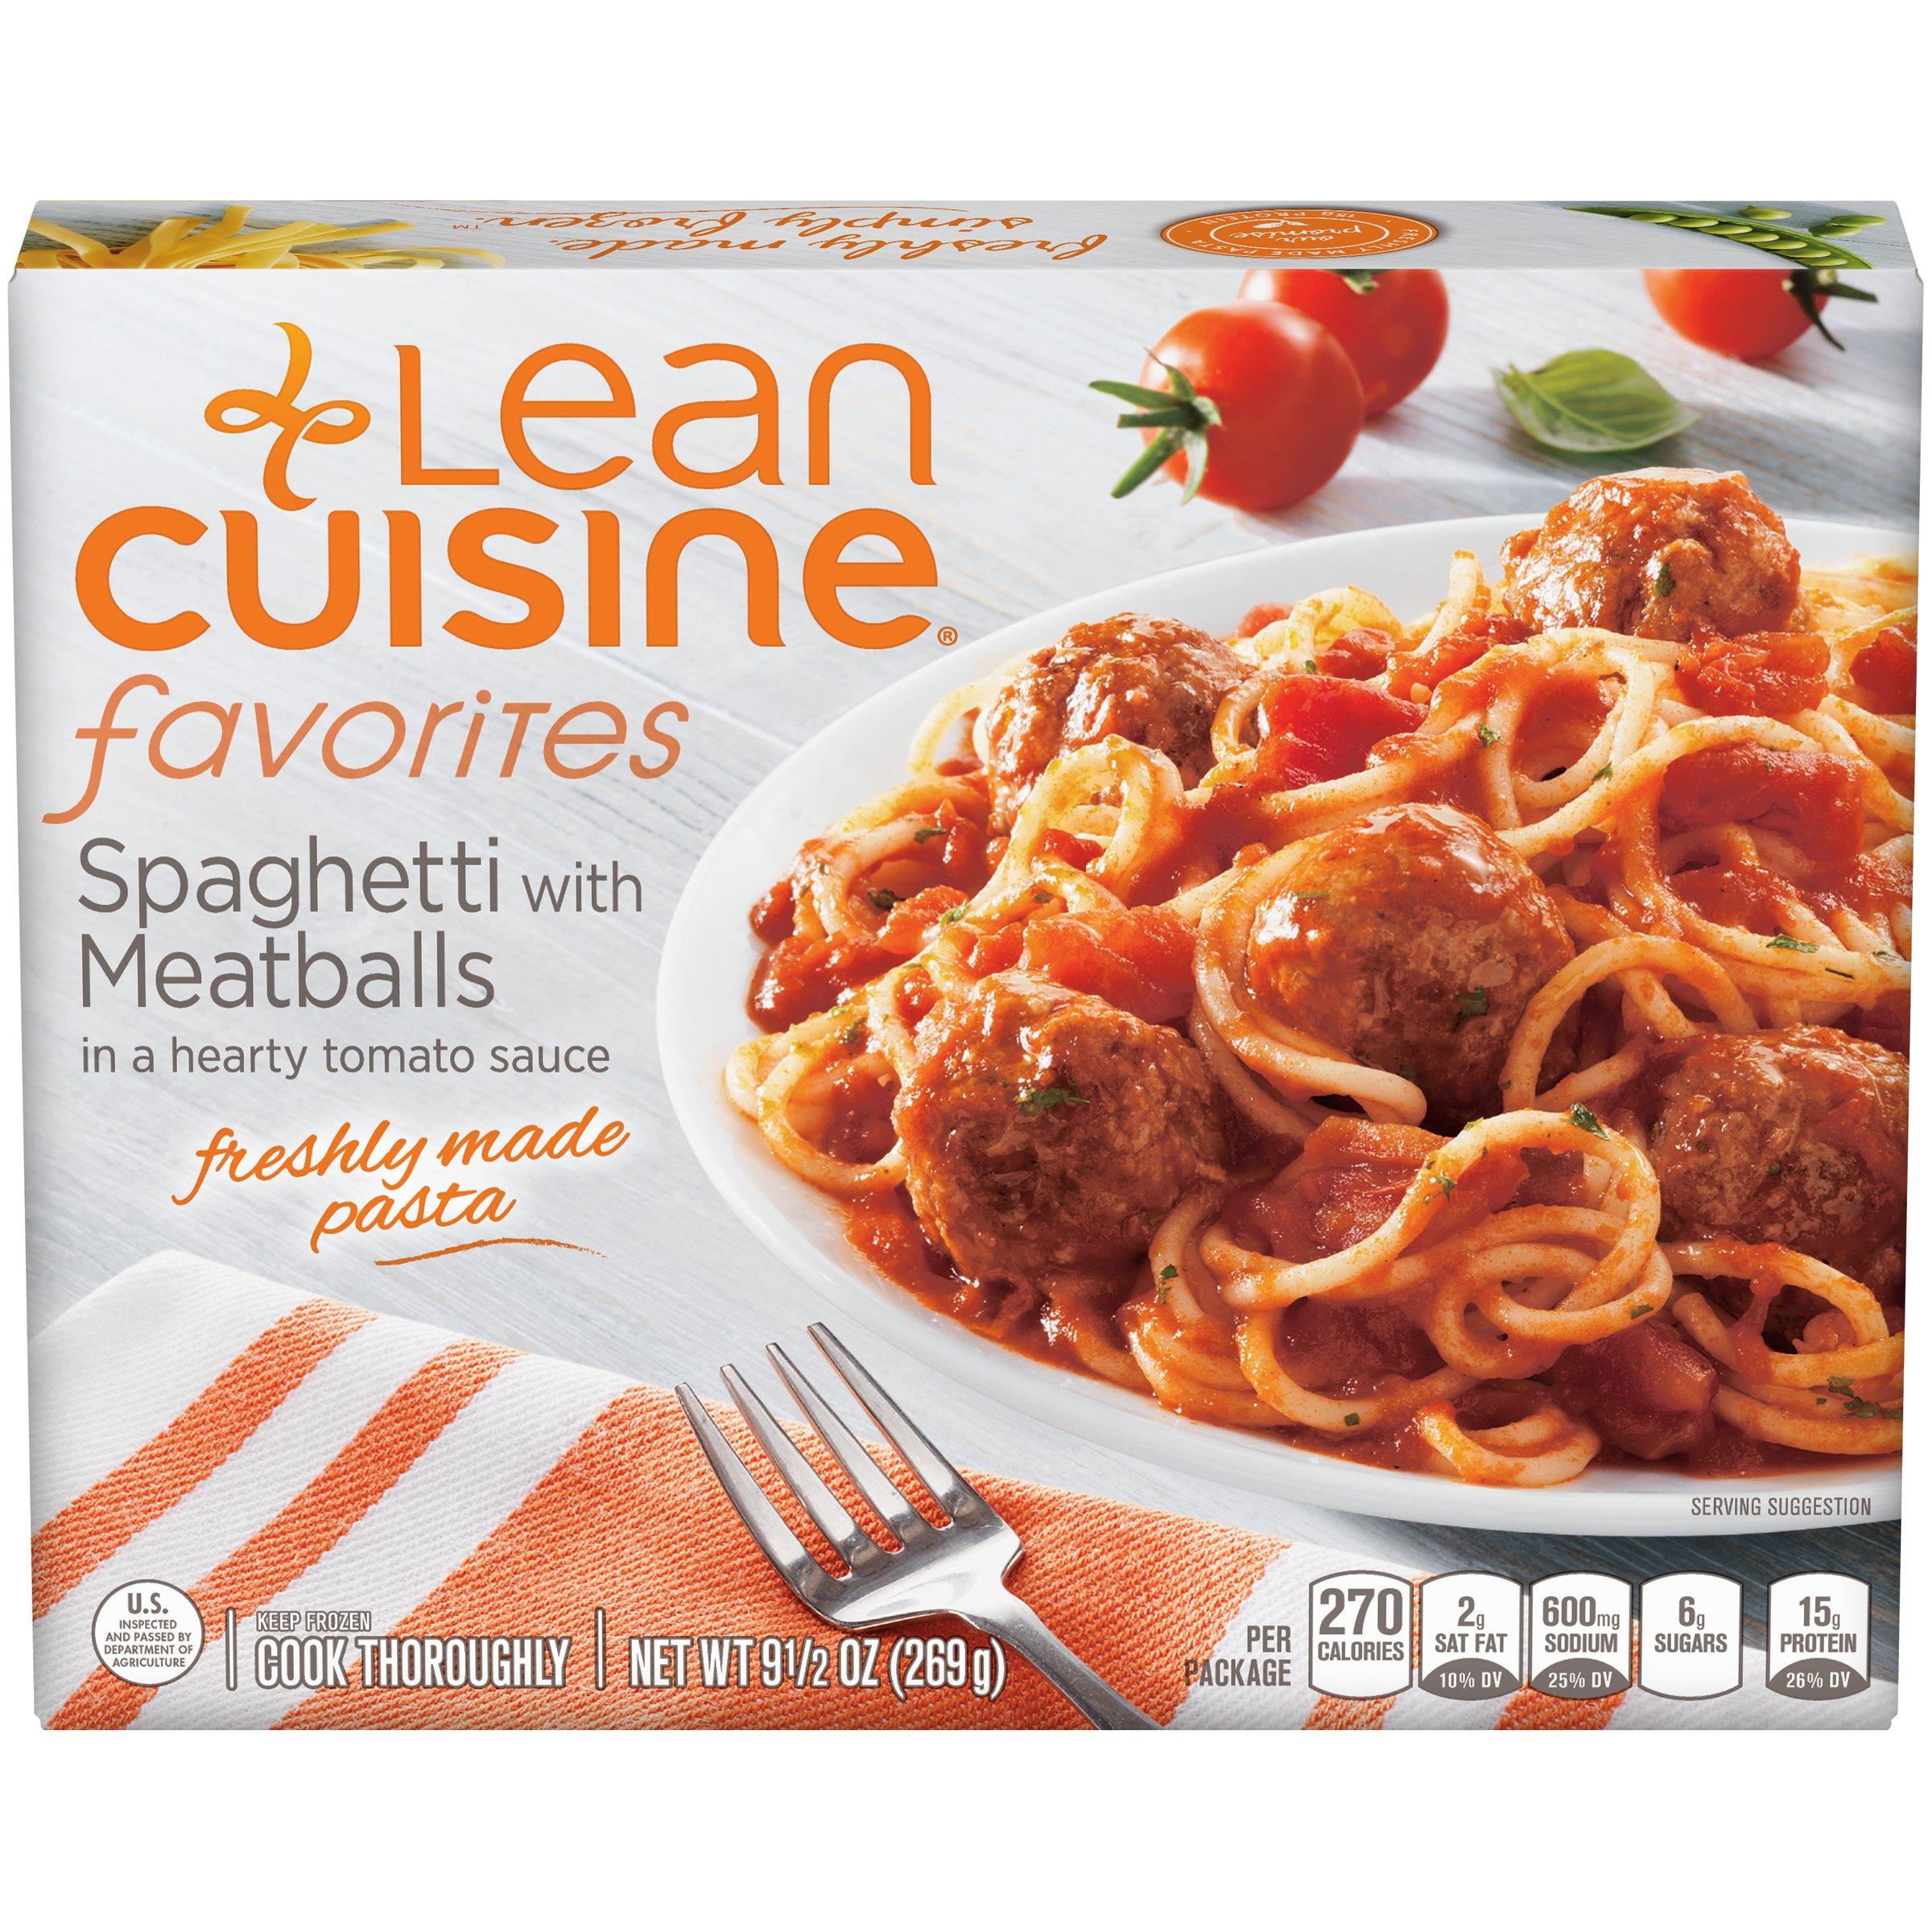 Lean Cuisine Spaghetti and Meatballs 9.5 oz, Pack of 12